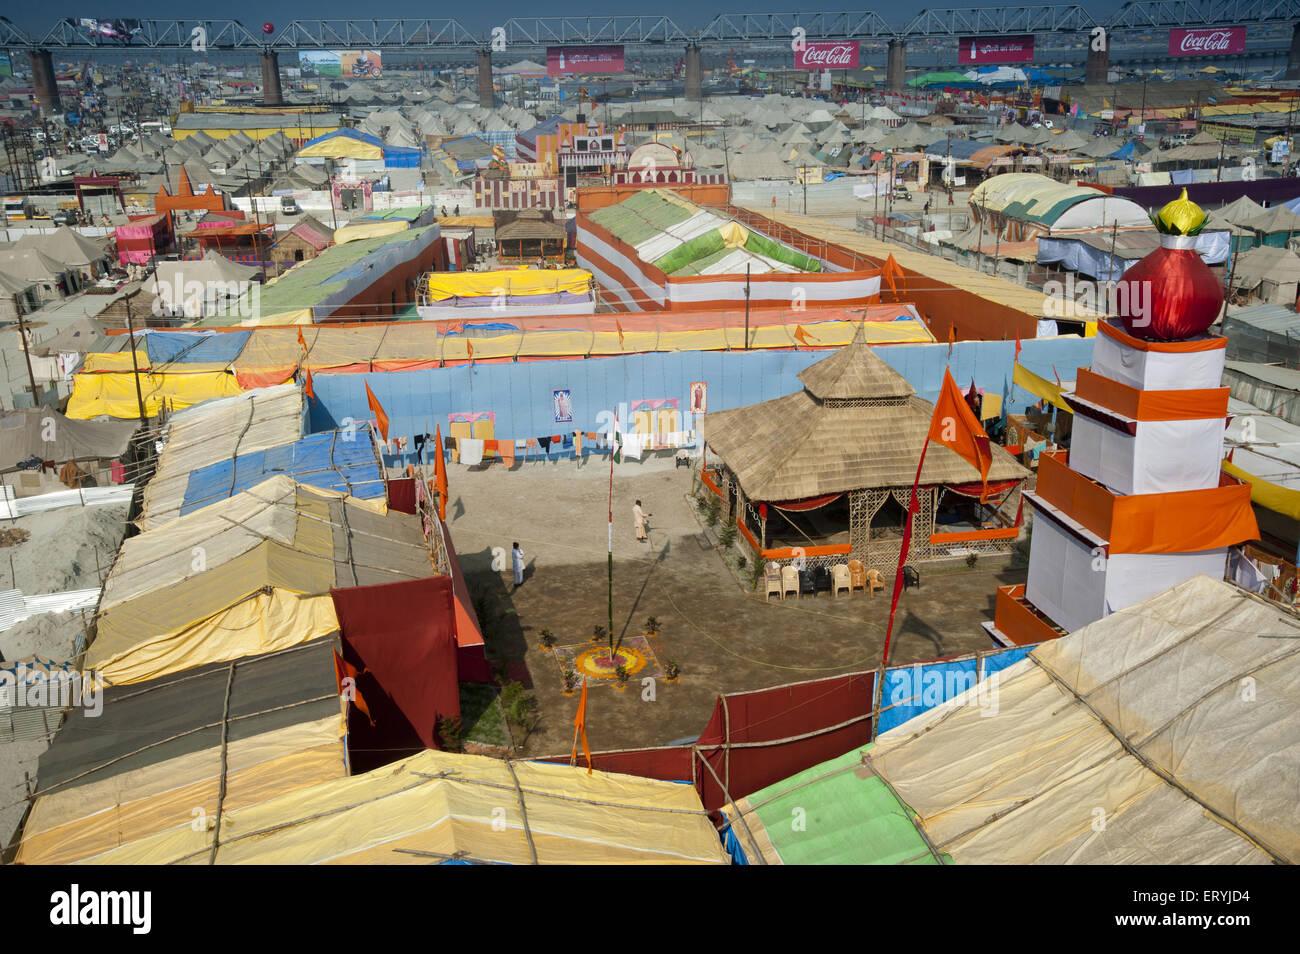 plastic Tent House in kumbha mela allahabad uttar pradesh India & plastic Tent House in kumbha mela allahabad uttar pradesh India ...